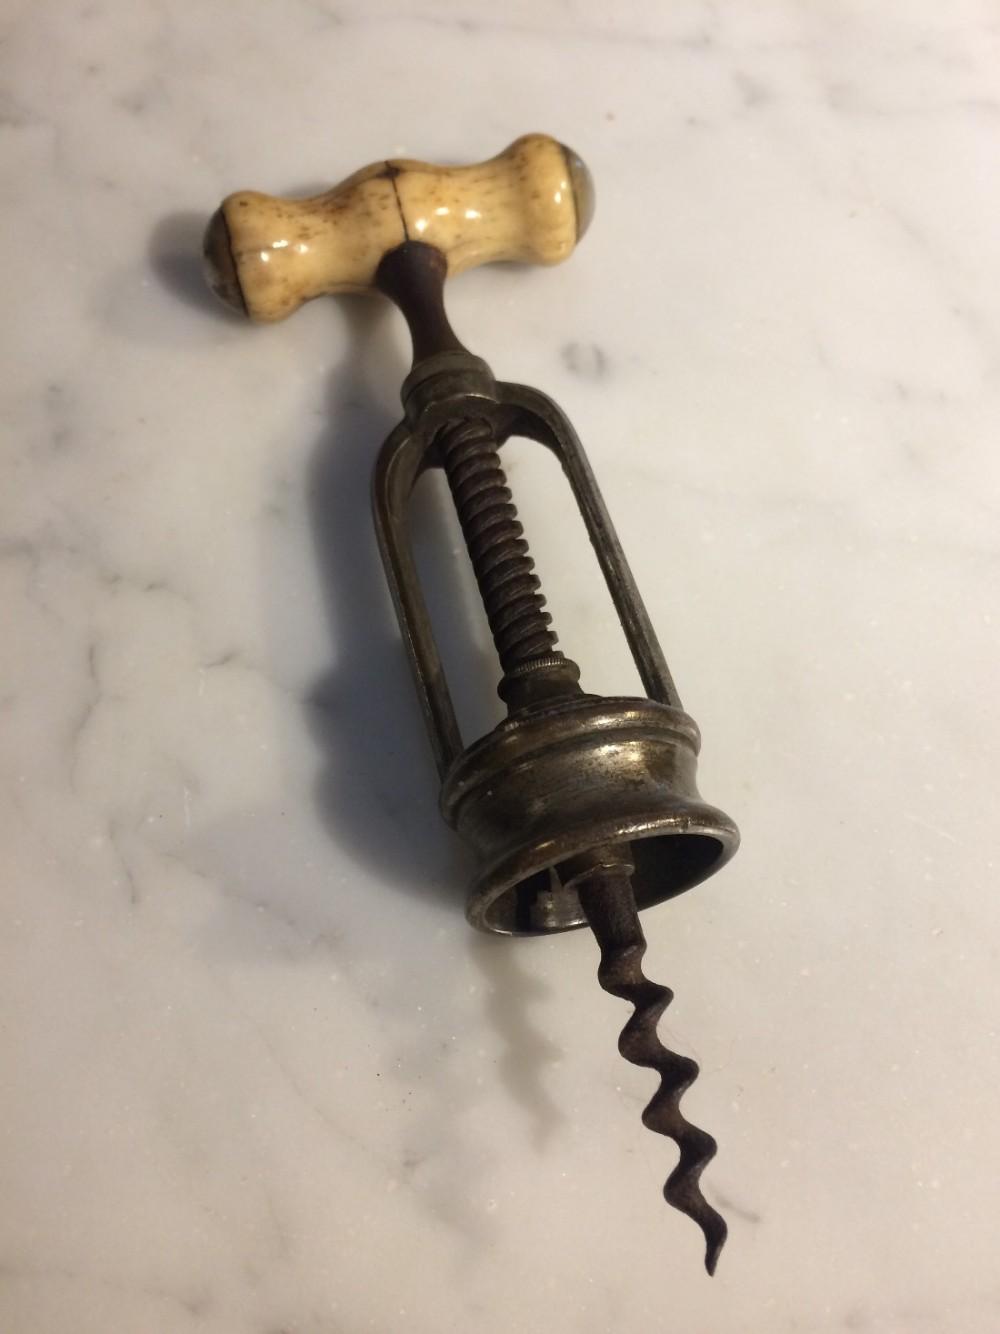 l'excelsior corkscrew